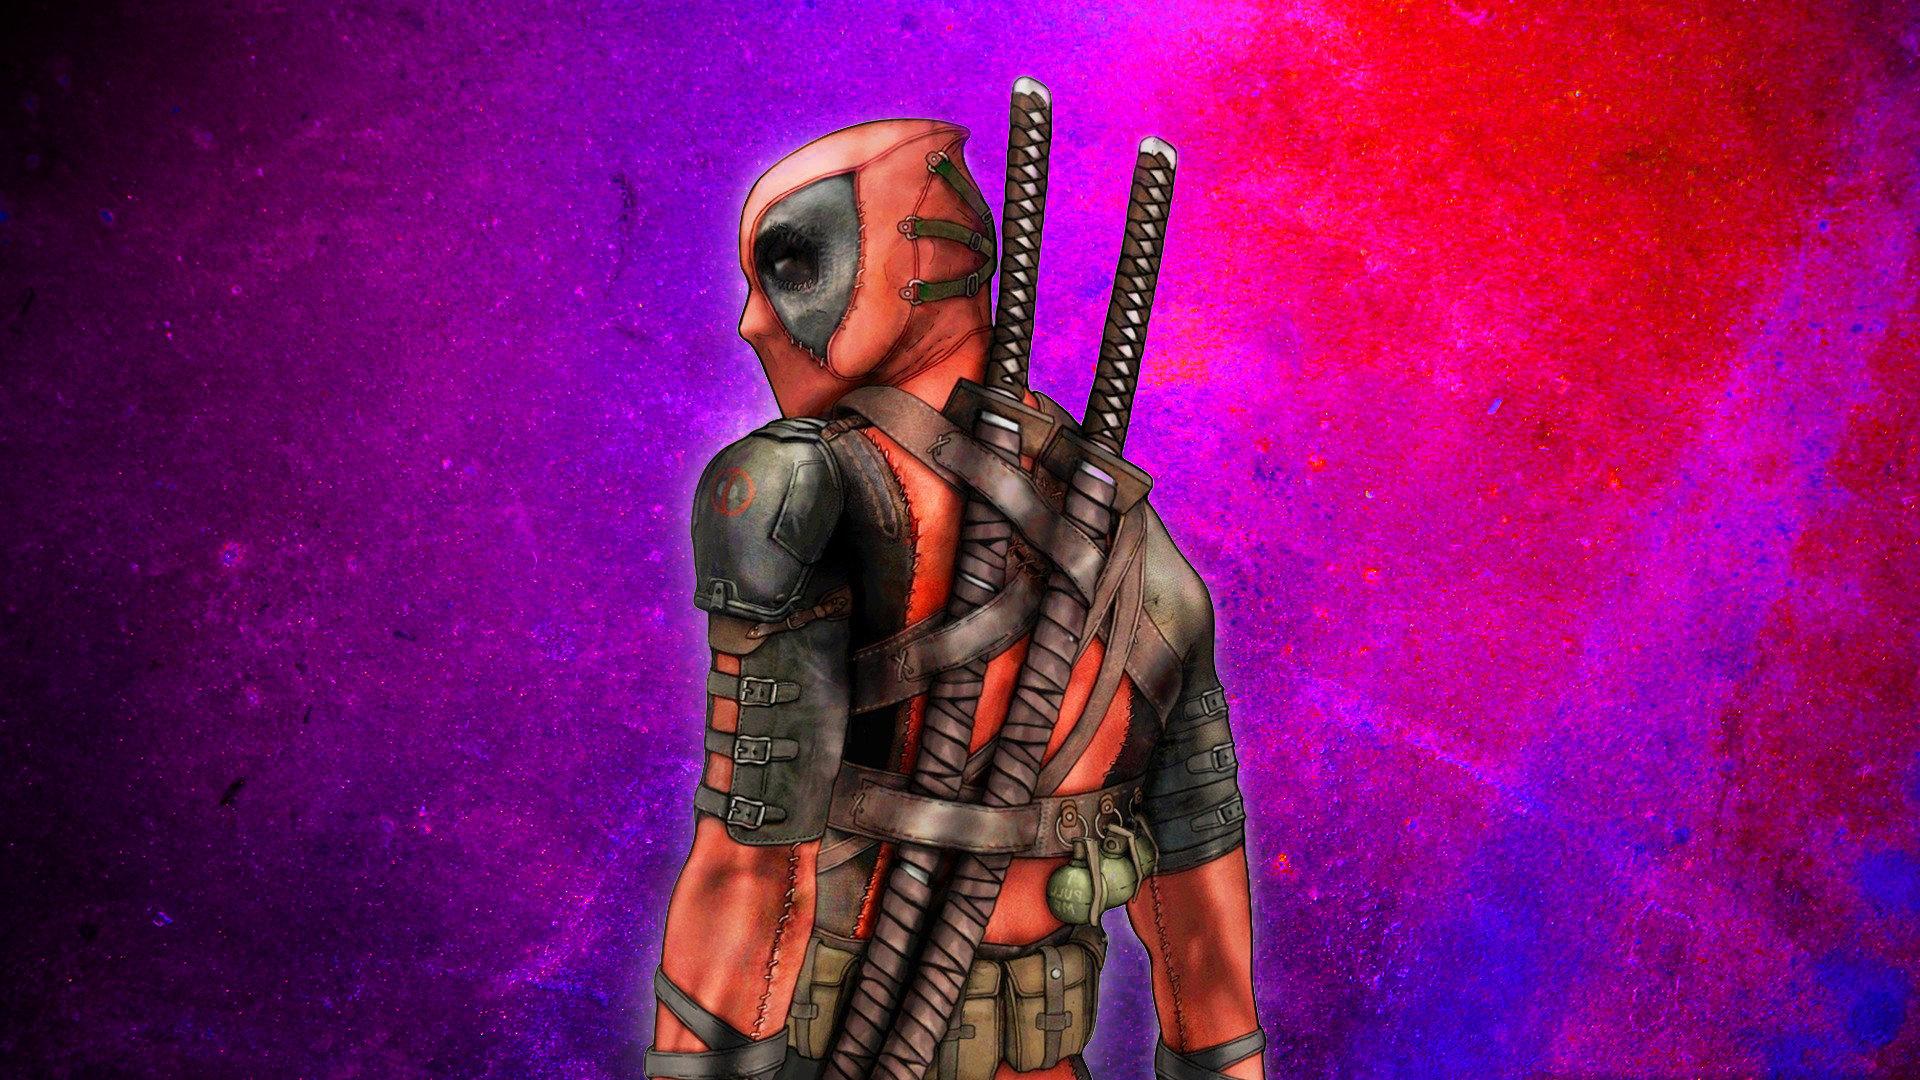 Best Deadpool Wallpaper Id 350313 For High Resolution Full Hd 1080p